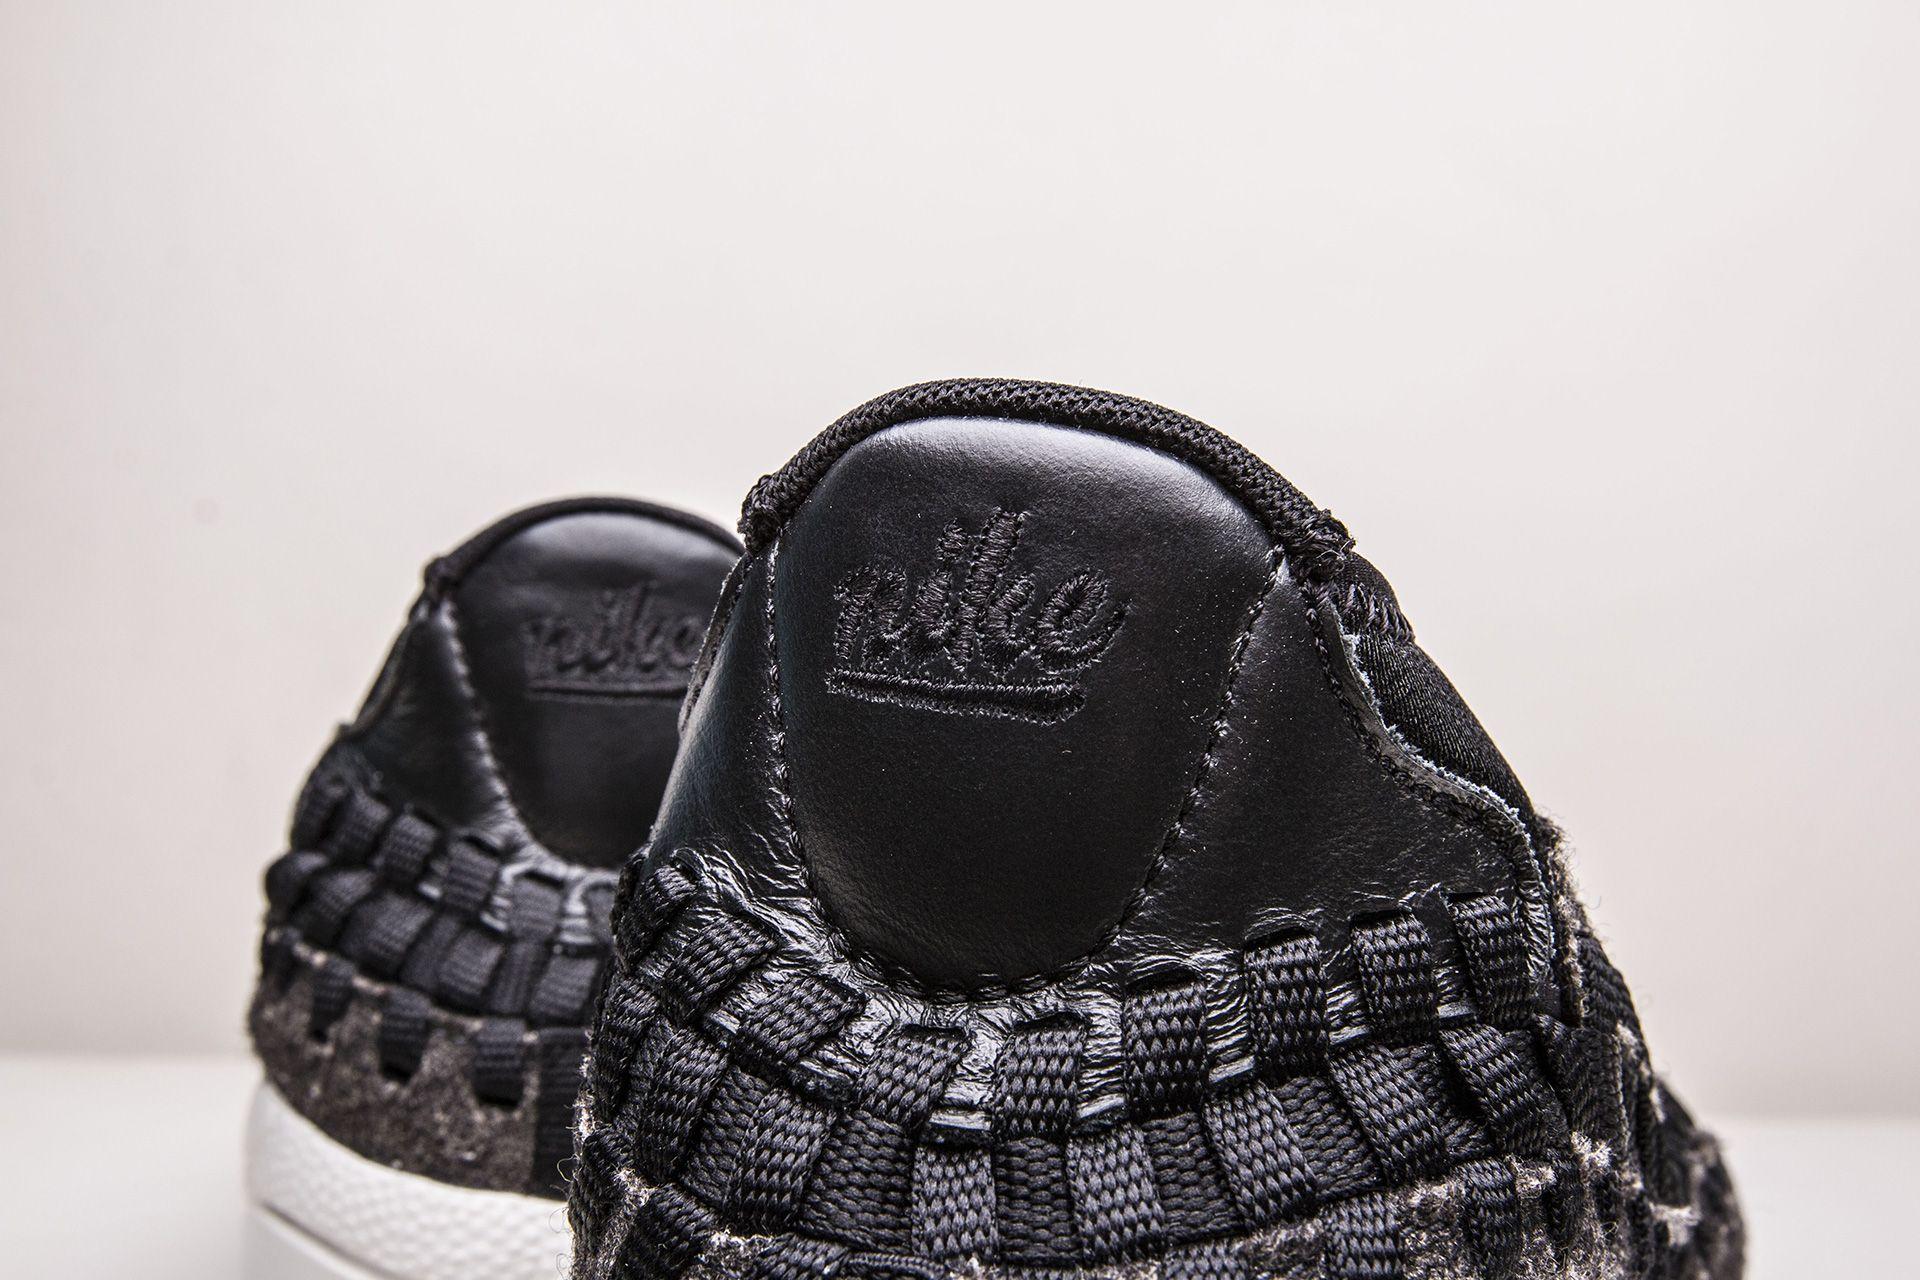 info for 9d99b f0025 ... Купить мужские черные кроссовки Nike Air Footscape Woven Chukka SE - фото  7 картинки ...